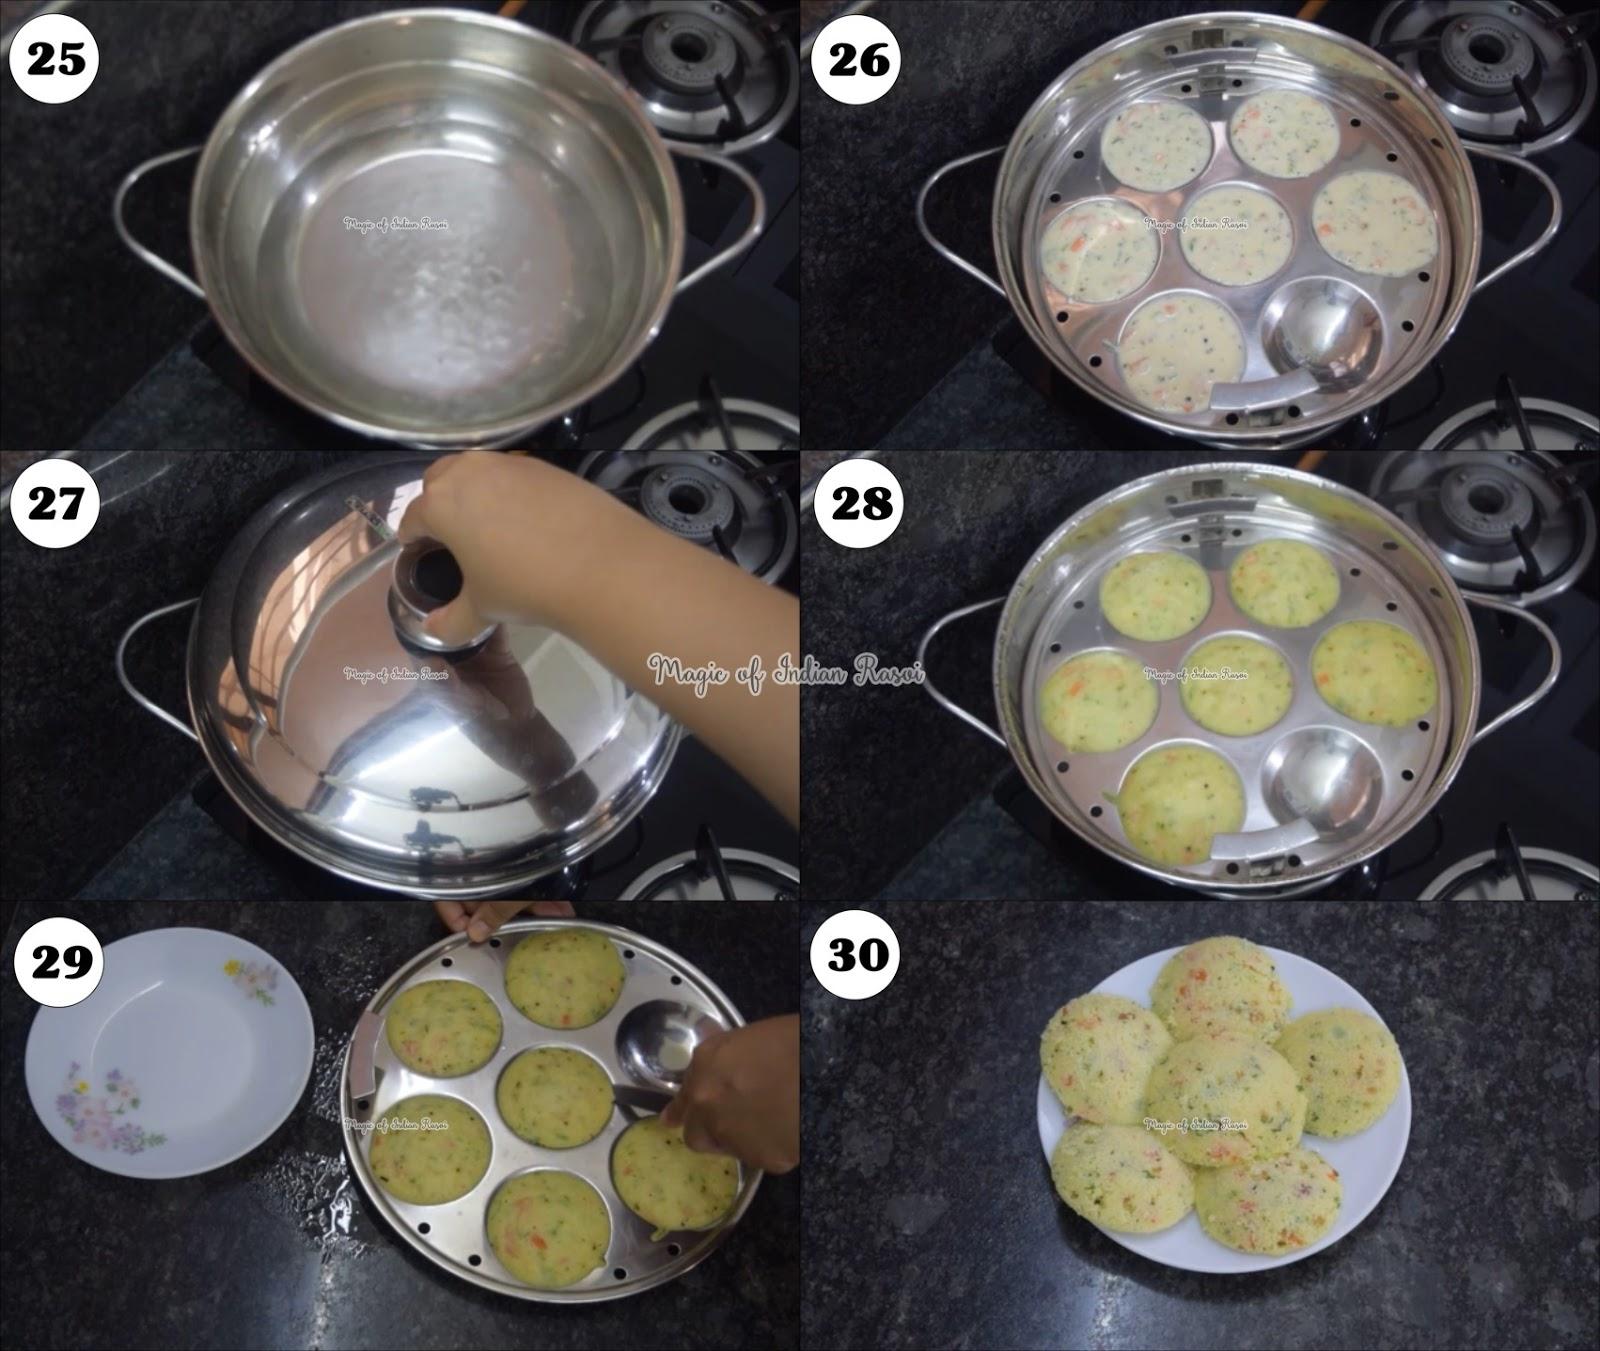 Instant Rava Idli Mix Recipe - रवा इडली मिक्स घर पर बनाये - Priya R - Magic of Indian Rasoi